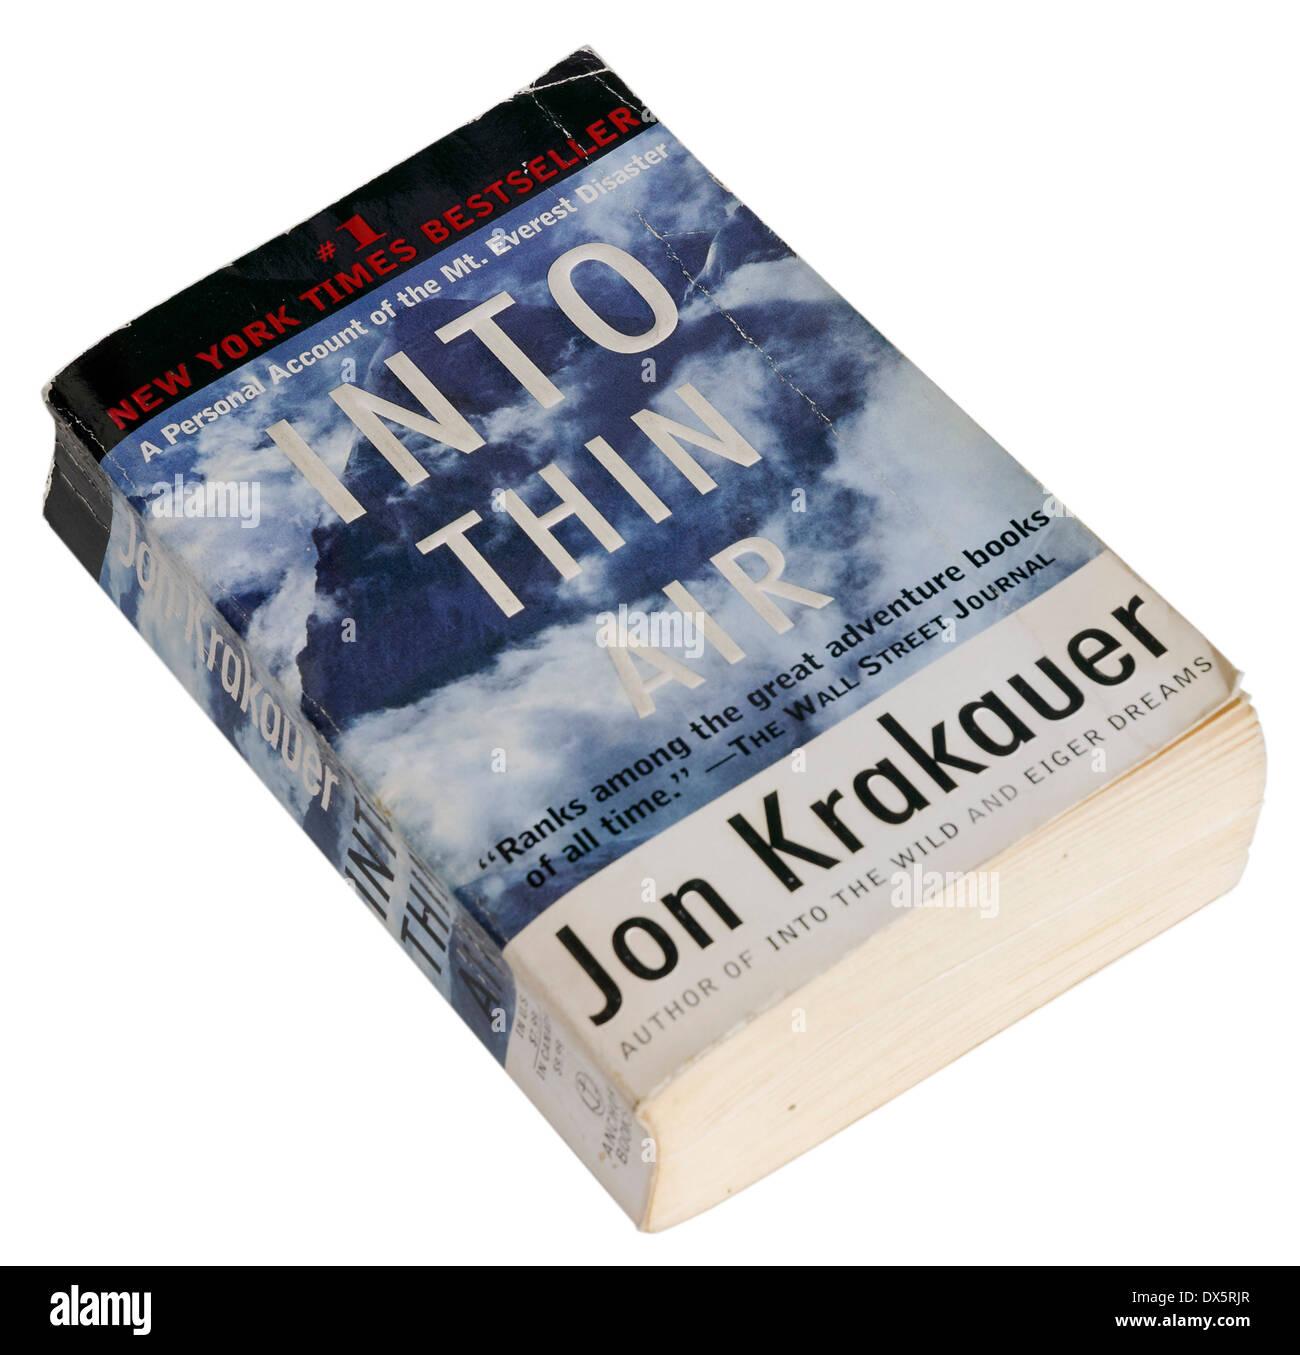 Into Thin Air by Jon Krakauer - Stock Image